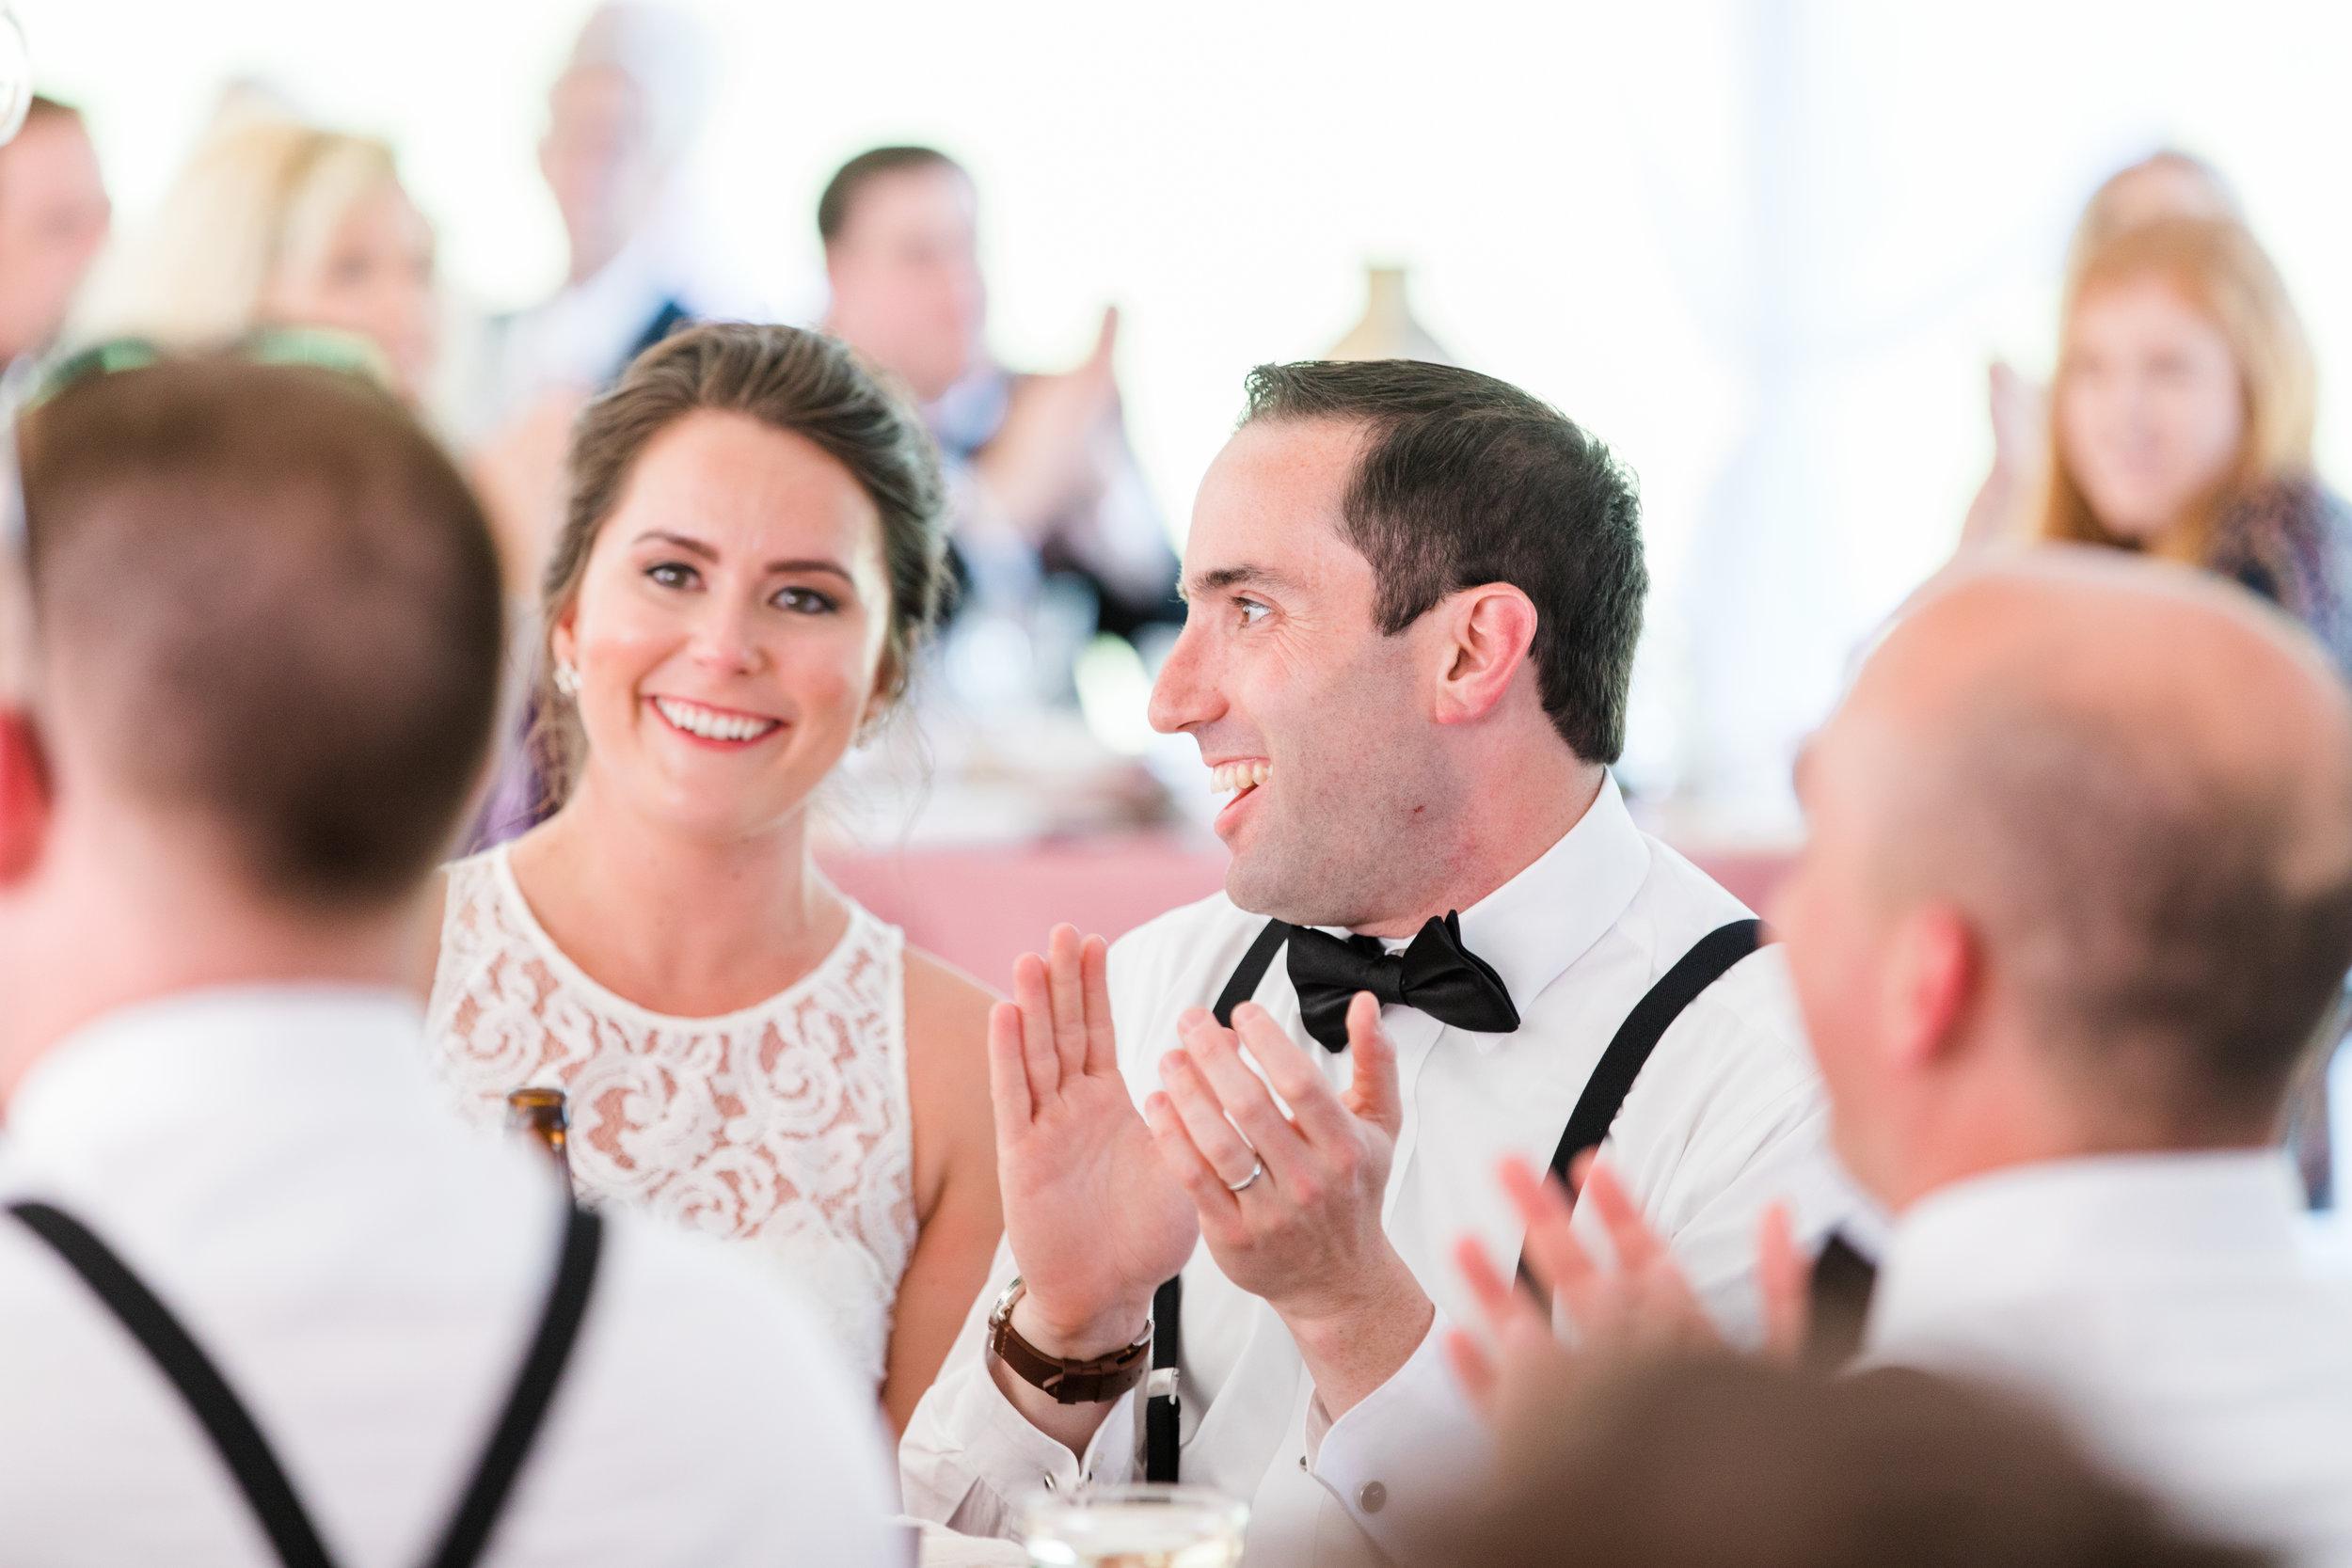 Zoller+Wedding+Reception+Toasts-32.jpg